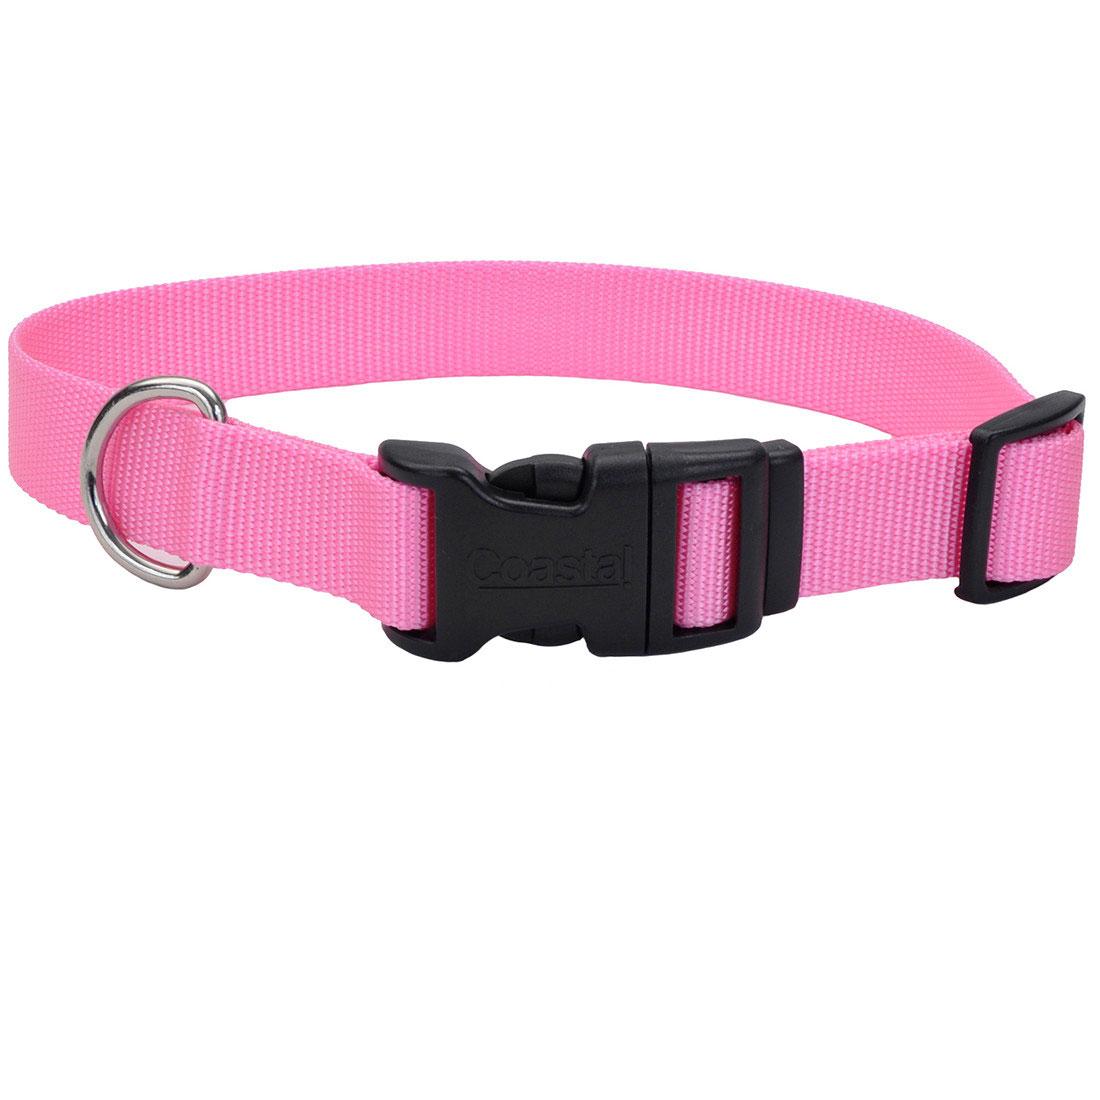 Coastal Pet Adjustable Nylon with Tuff Buckle Dog Collar, Bright Pink, 1-in Nylon x 14-in-20-in Neck Girth